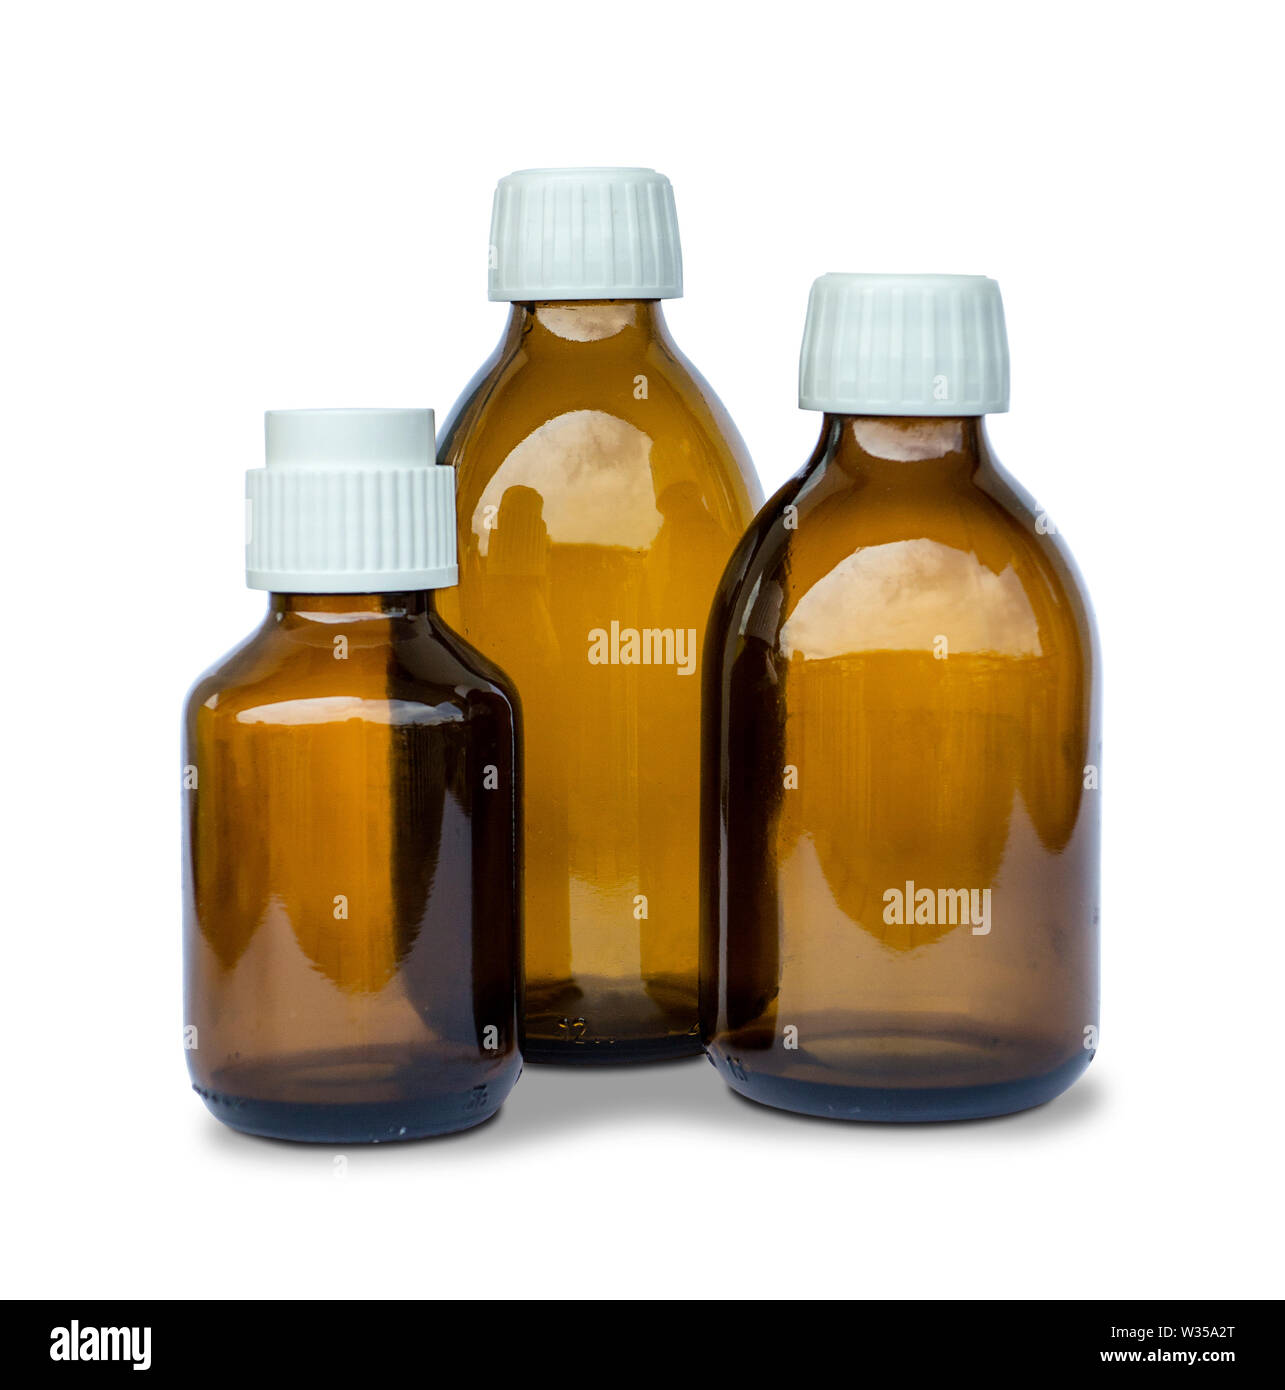 Bottles of Medicine isolated on white Stock Photo